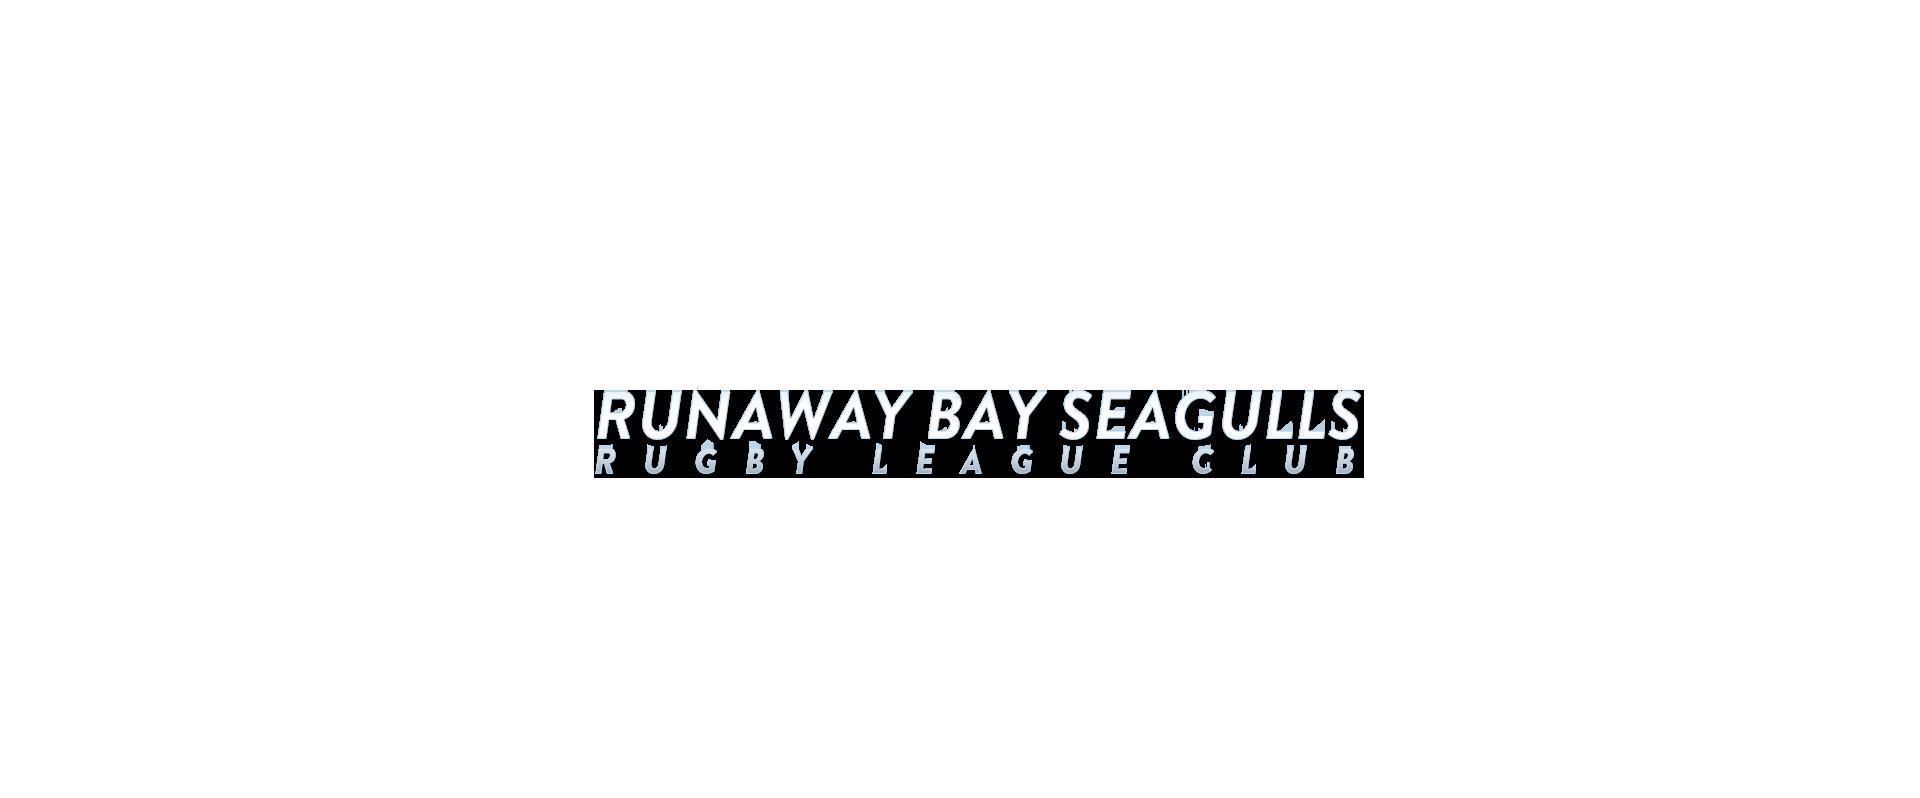 Runaway Bay Seagulls